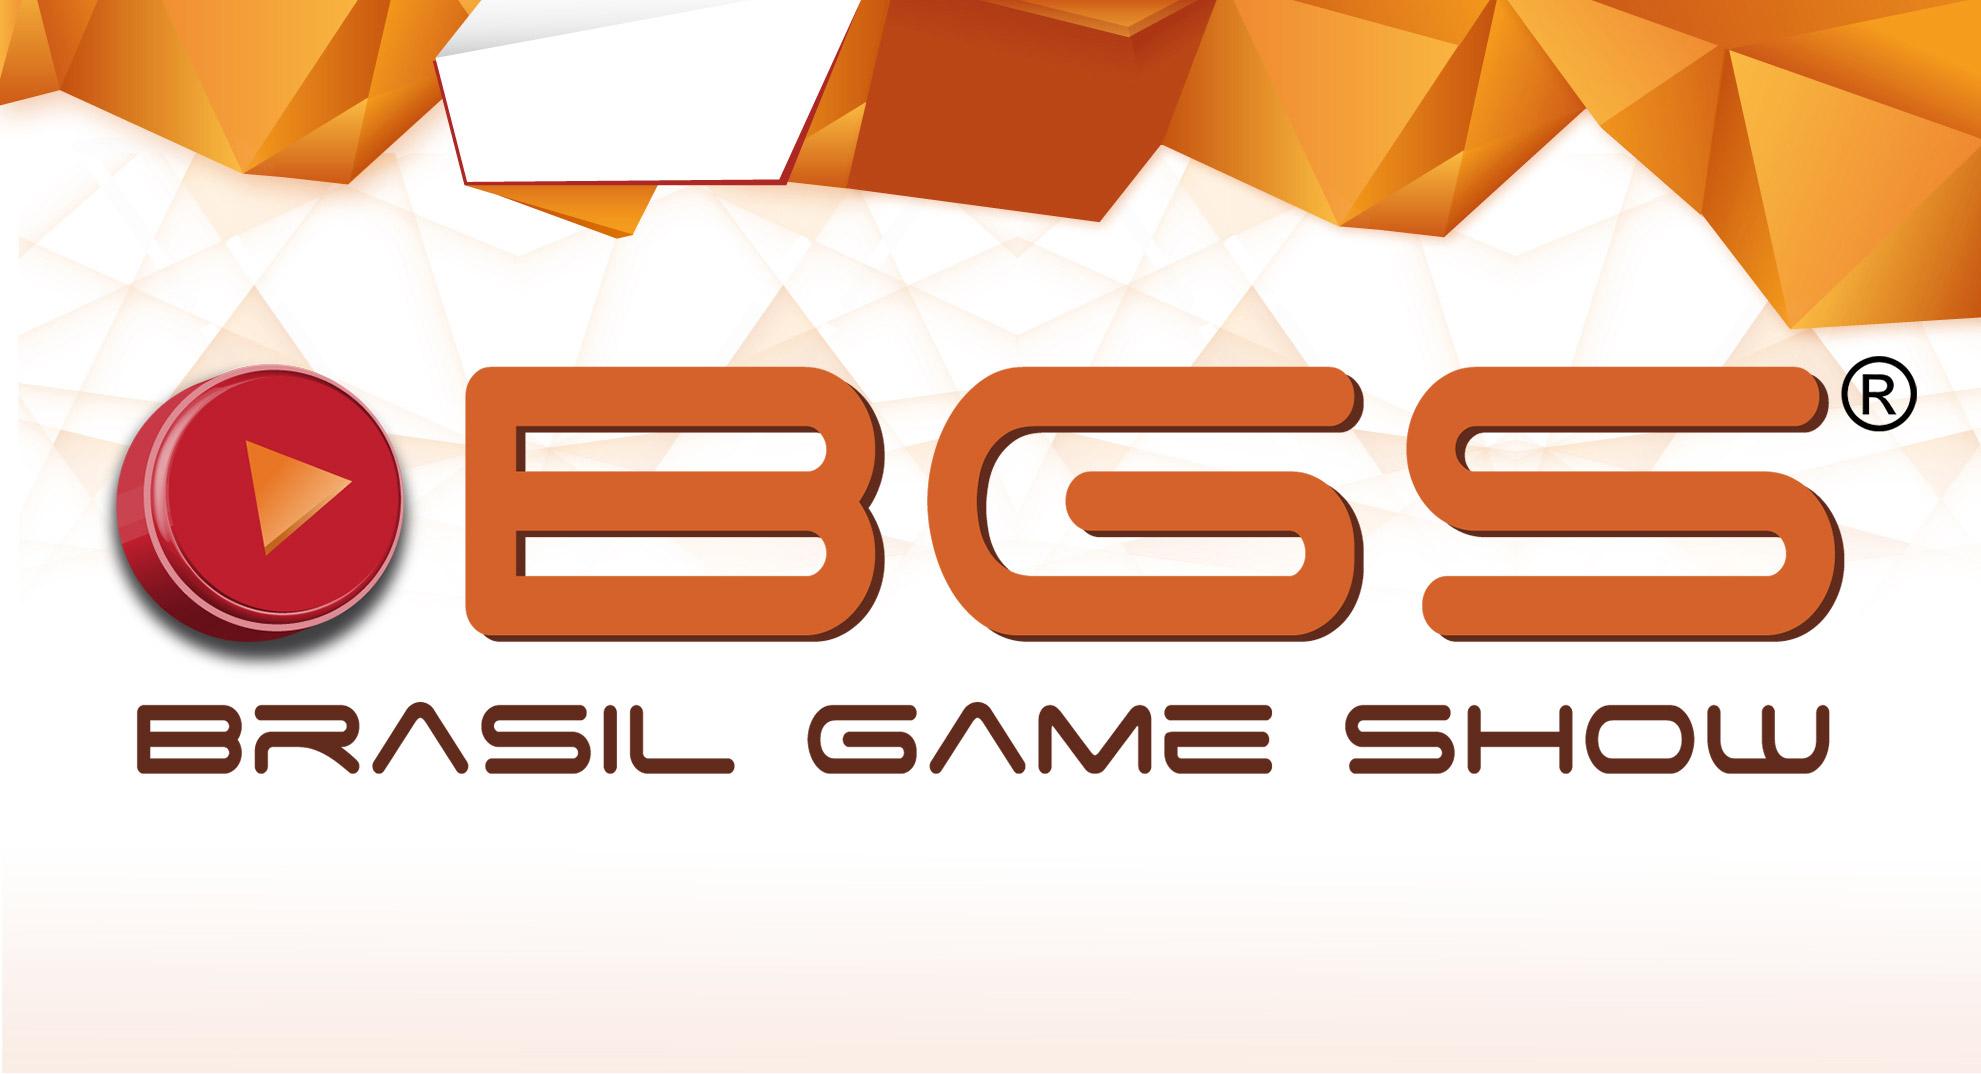 http://www.bonusstage.com.br/wp-content/uploads/2015/02/brasil-game-show.jpg